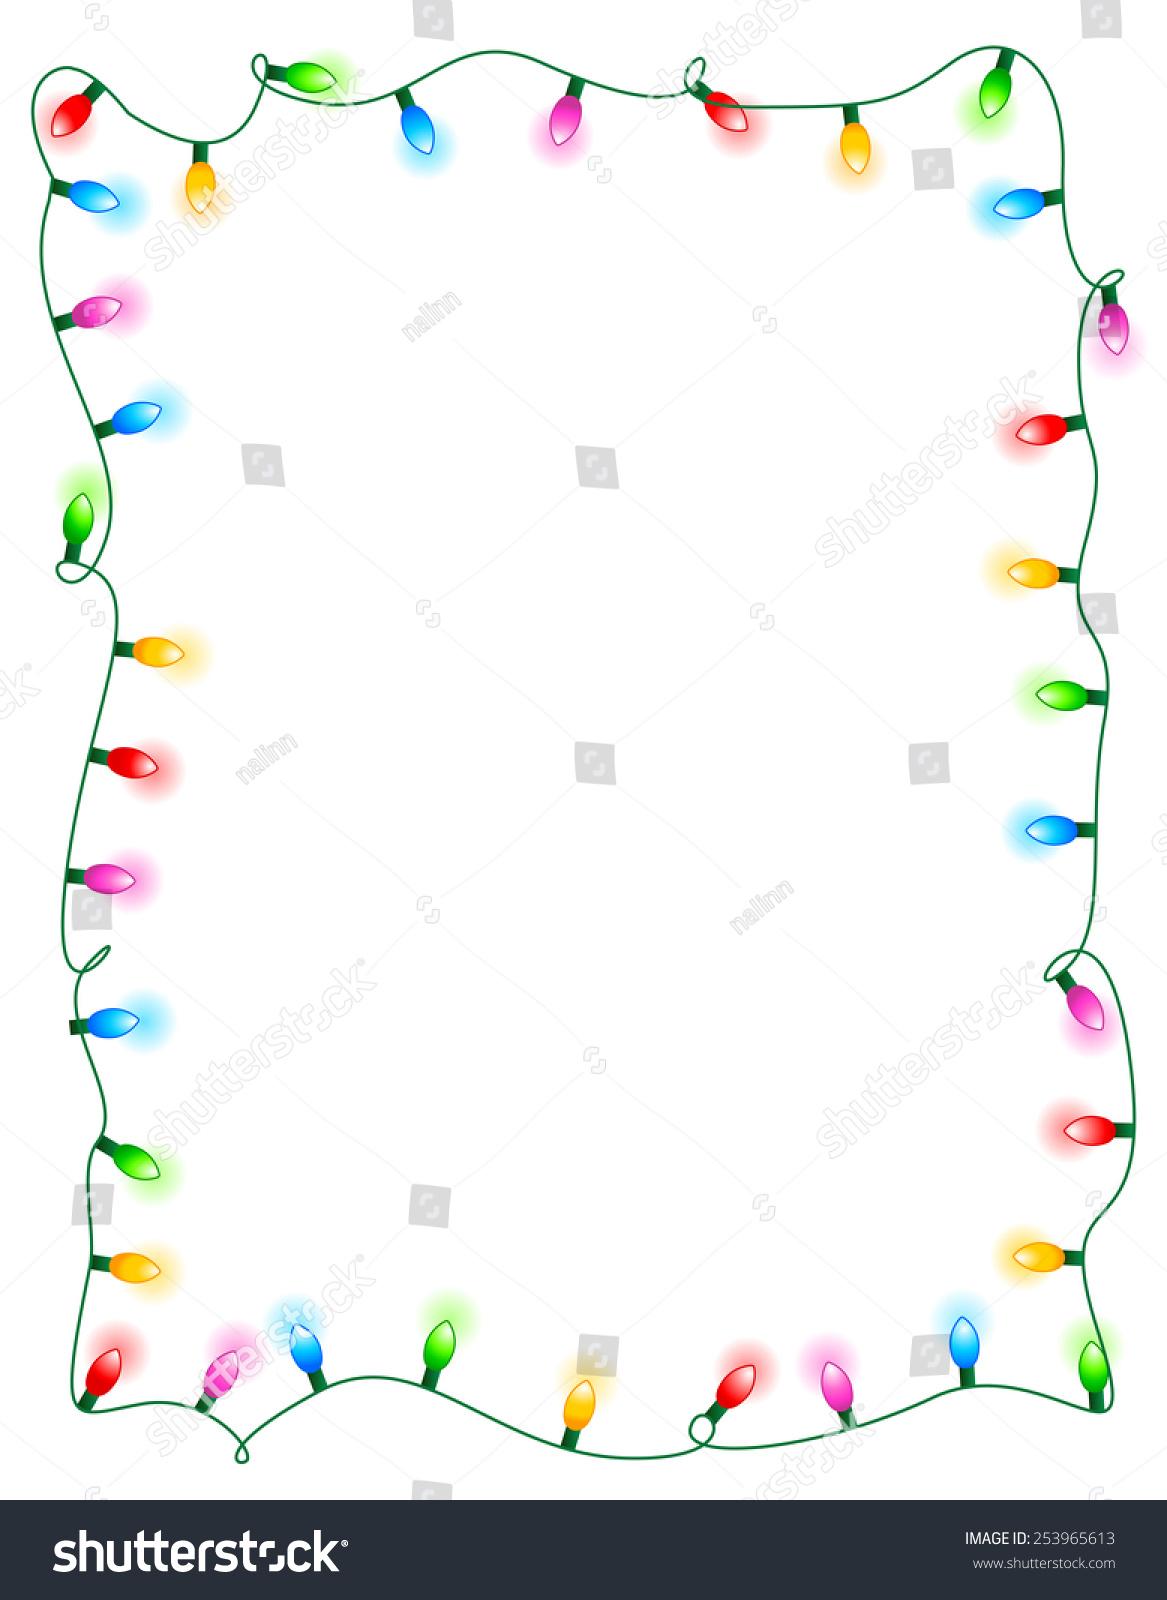 colorful glowing christmas lights border frame colorful holiday lights illustration - Christmas Lights Frame